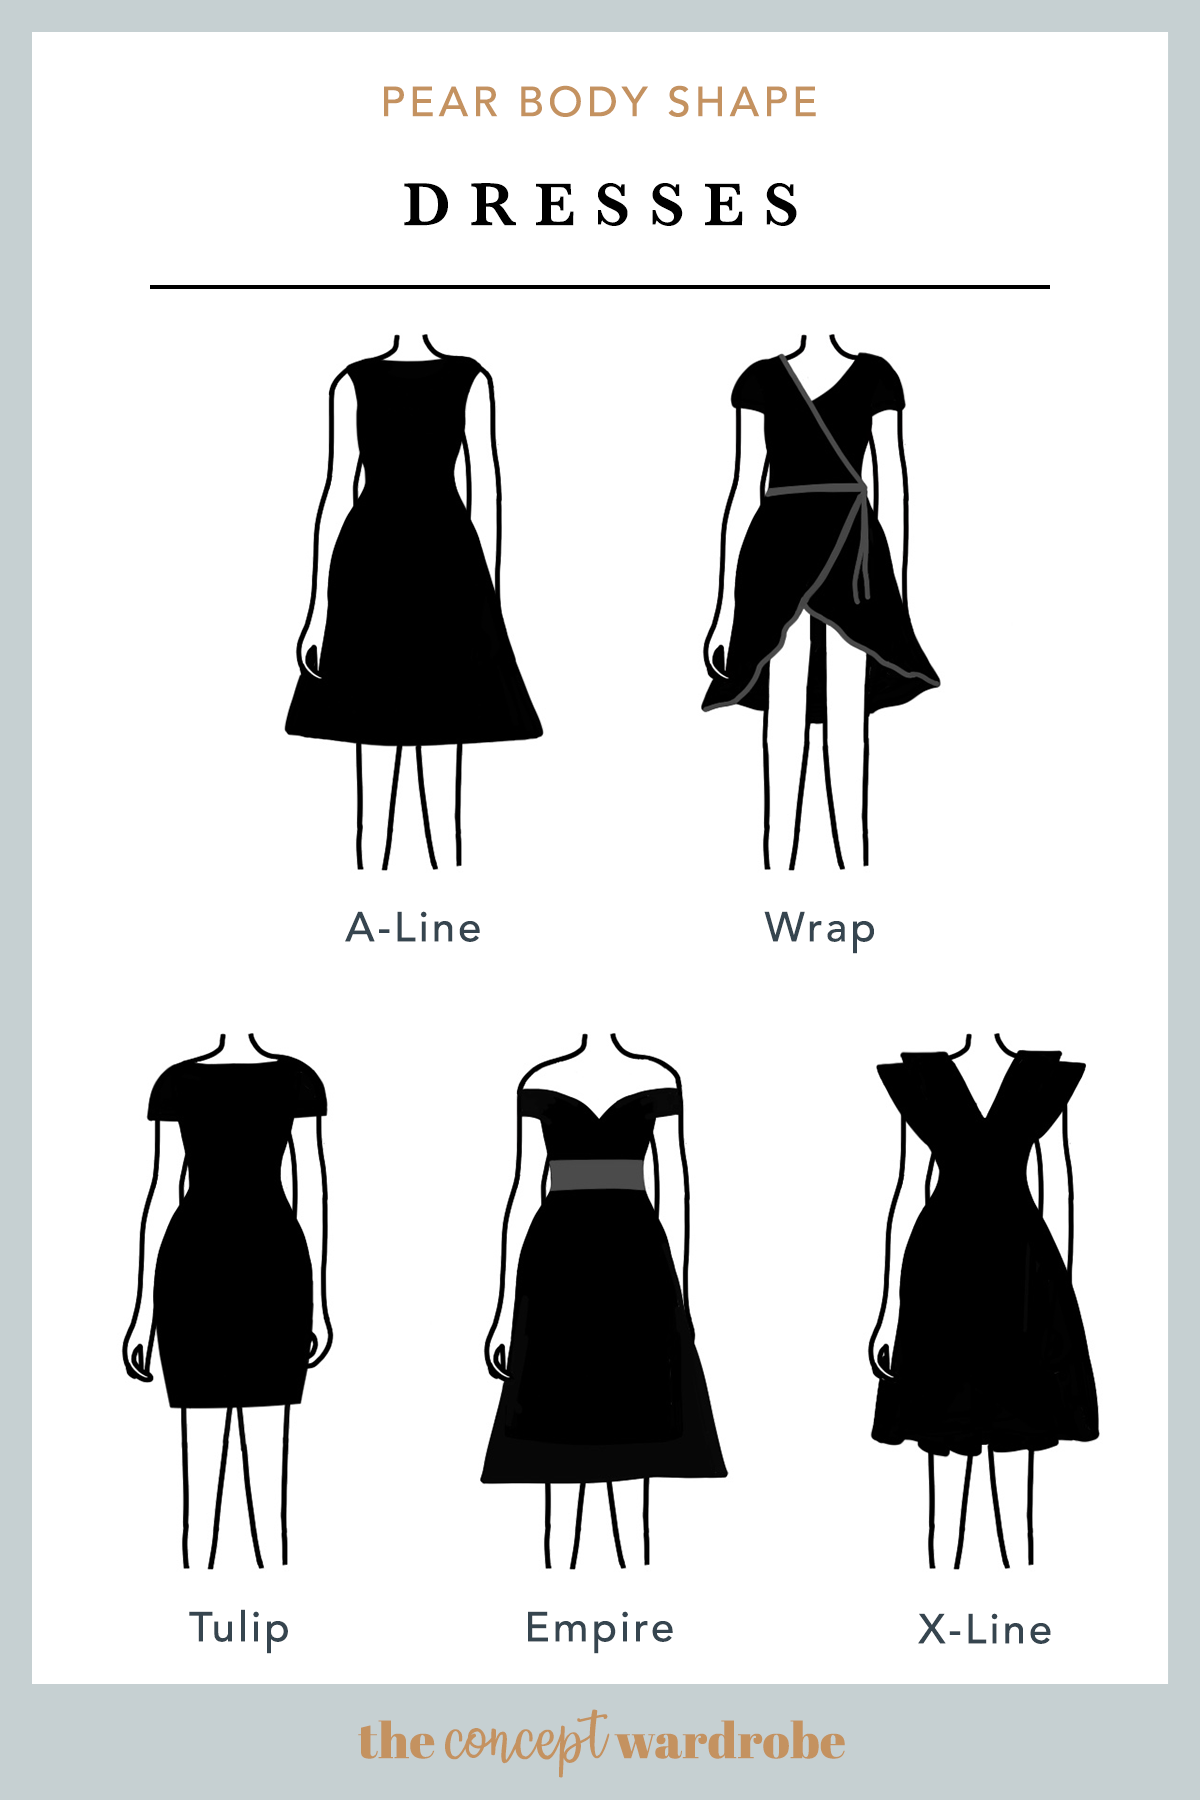 PEAR BODY SHAPE  Dresses  Pear body, Pear body shape, Pear body